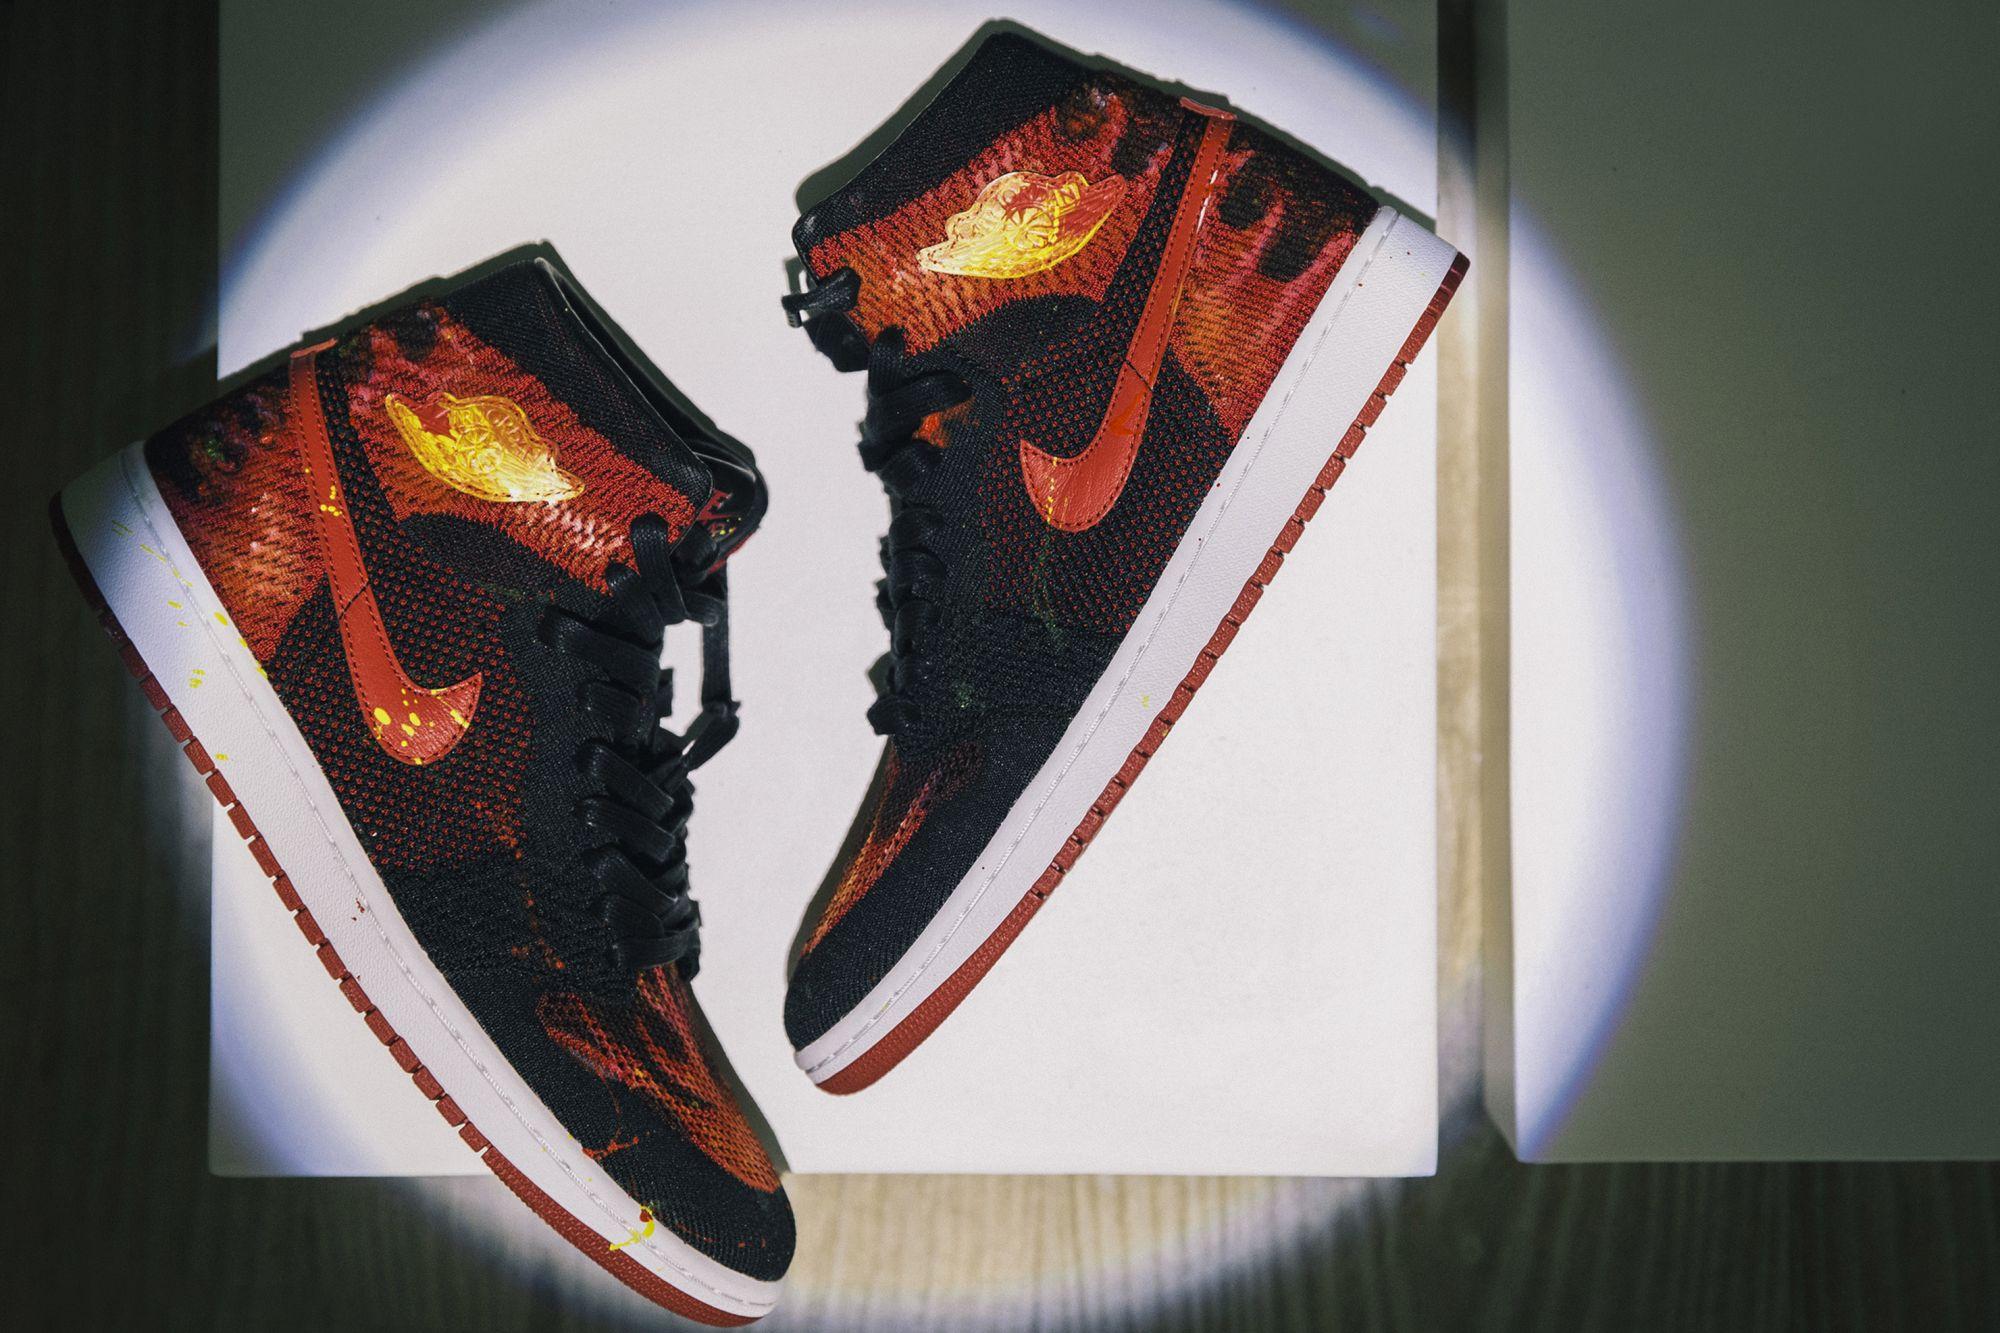 5 Minutes With Artist Daniel Cordas On Customising Jordans & Hermès Birkins